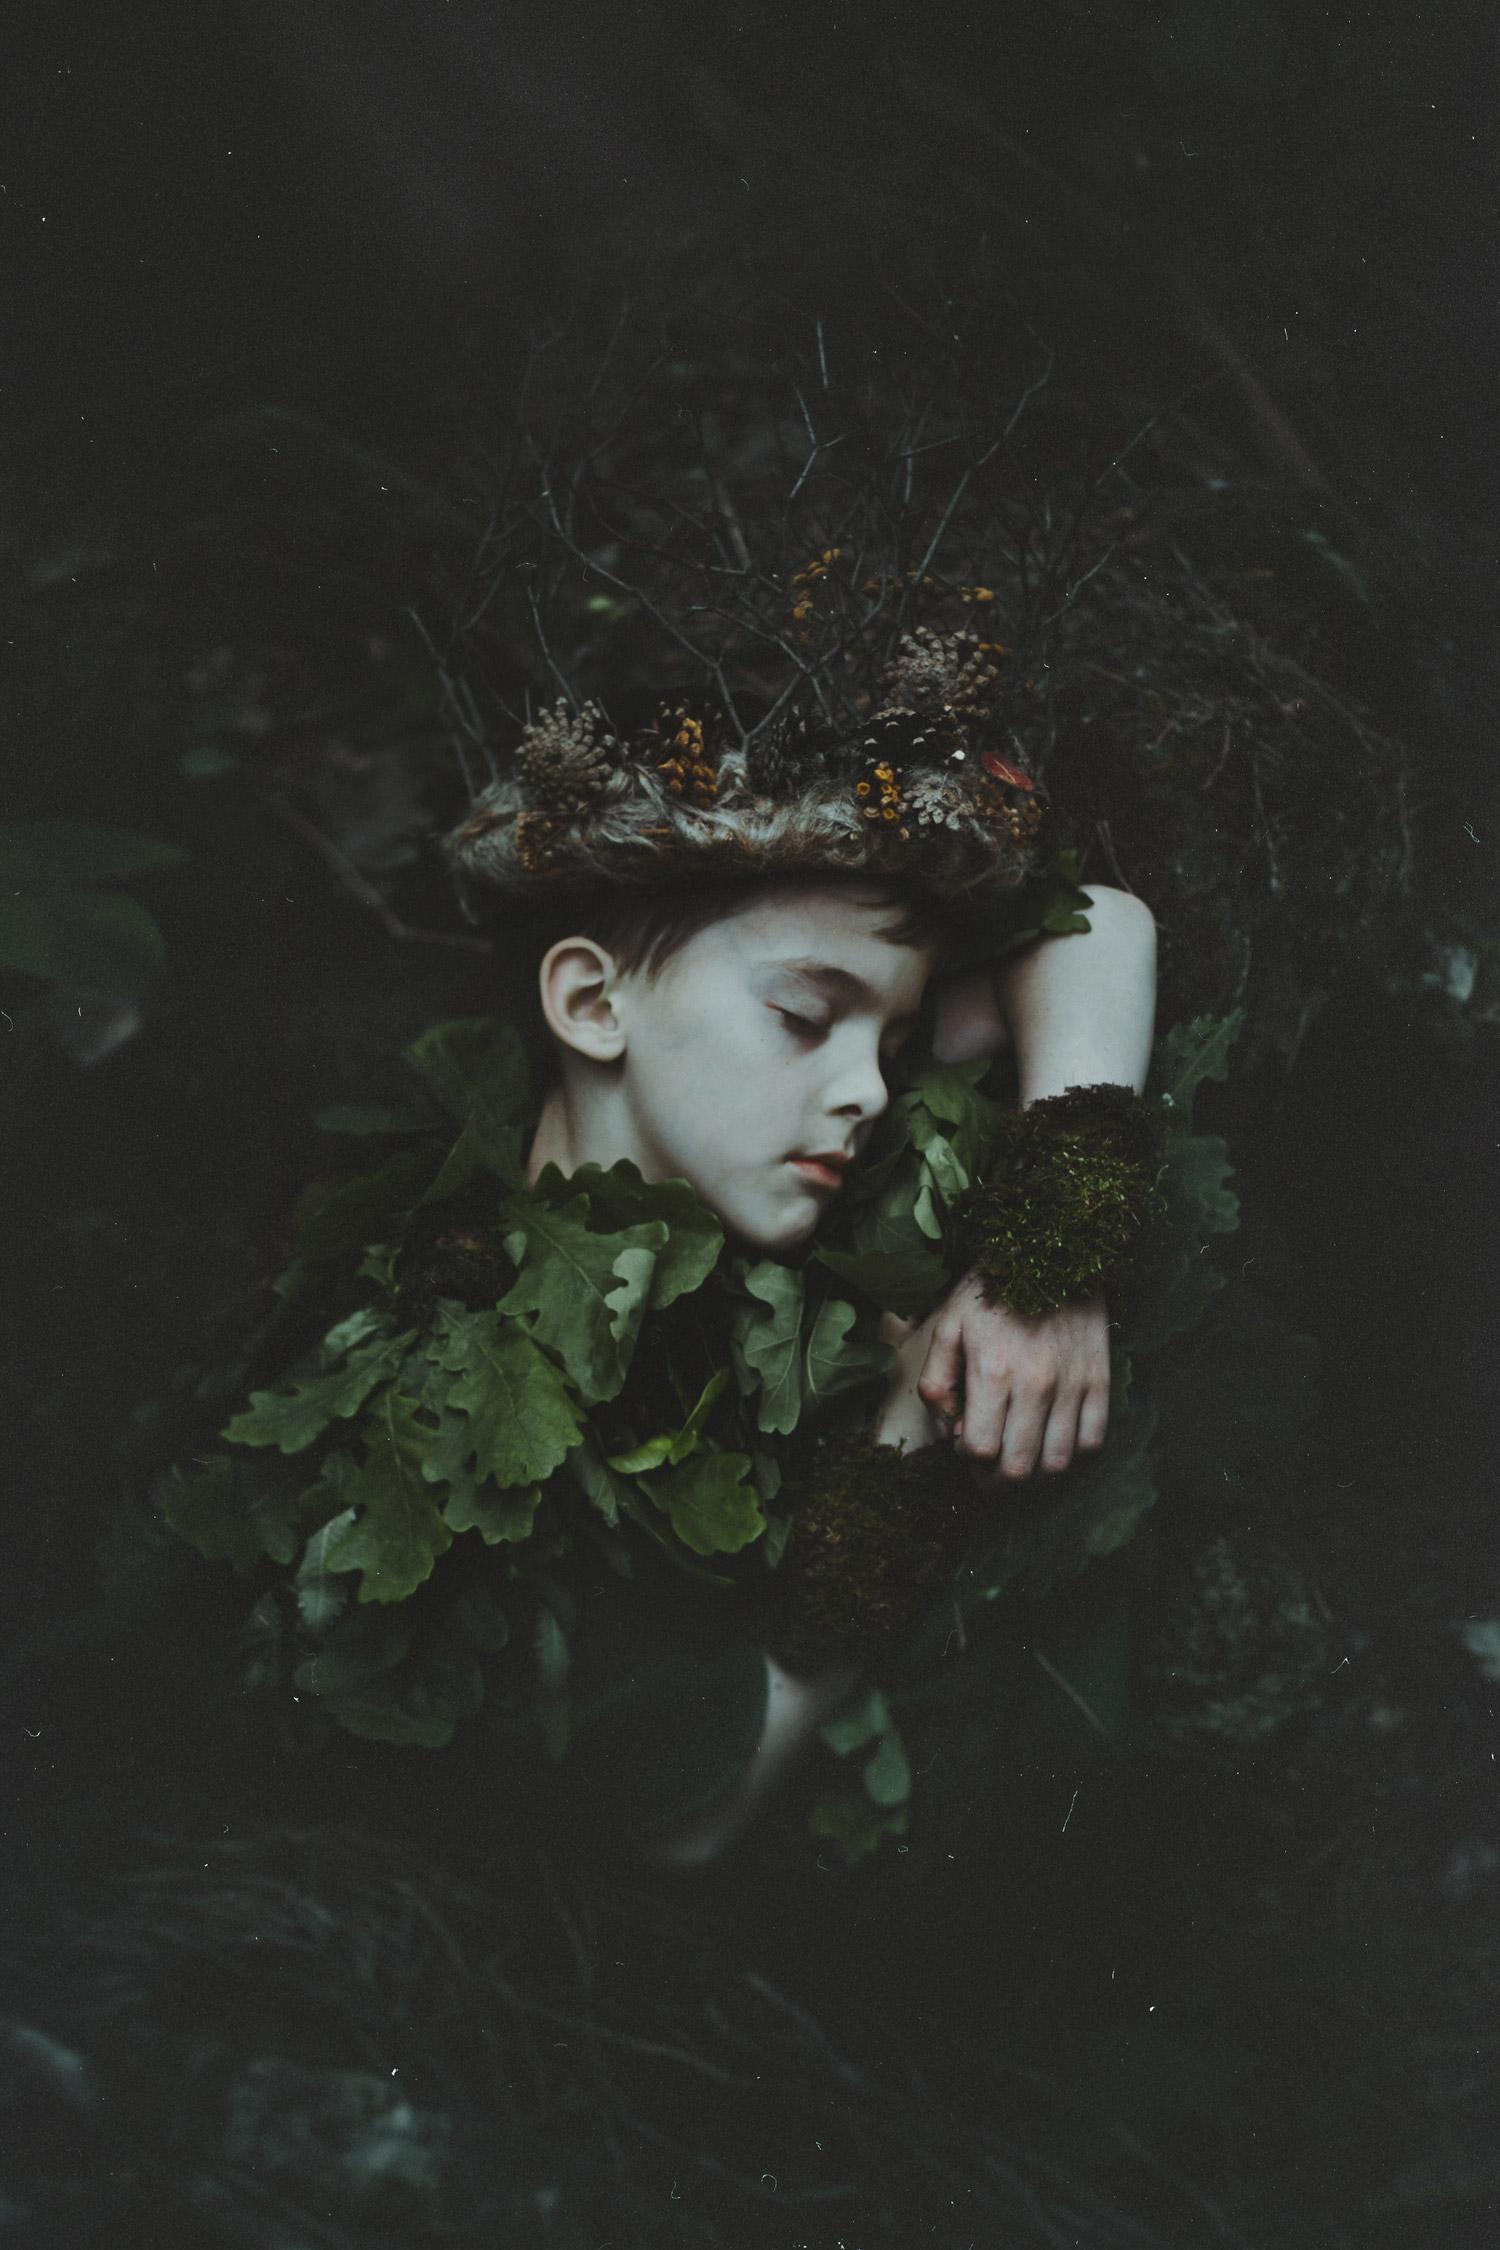 Natalia Drepina - forest boy